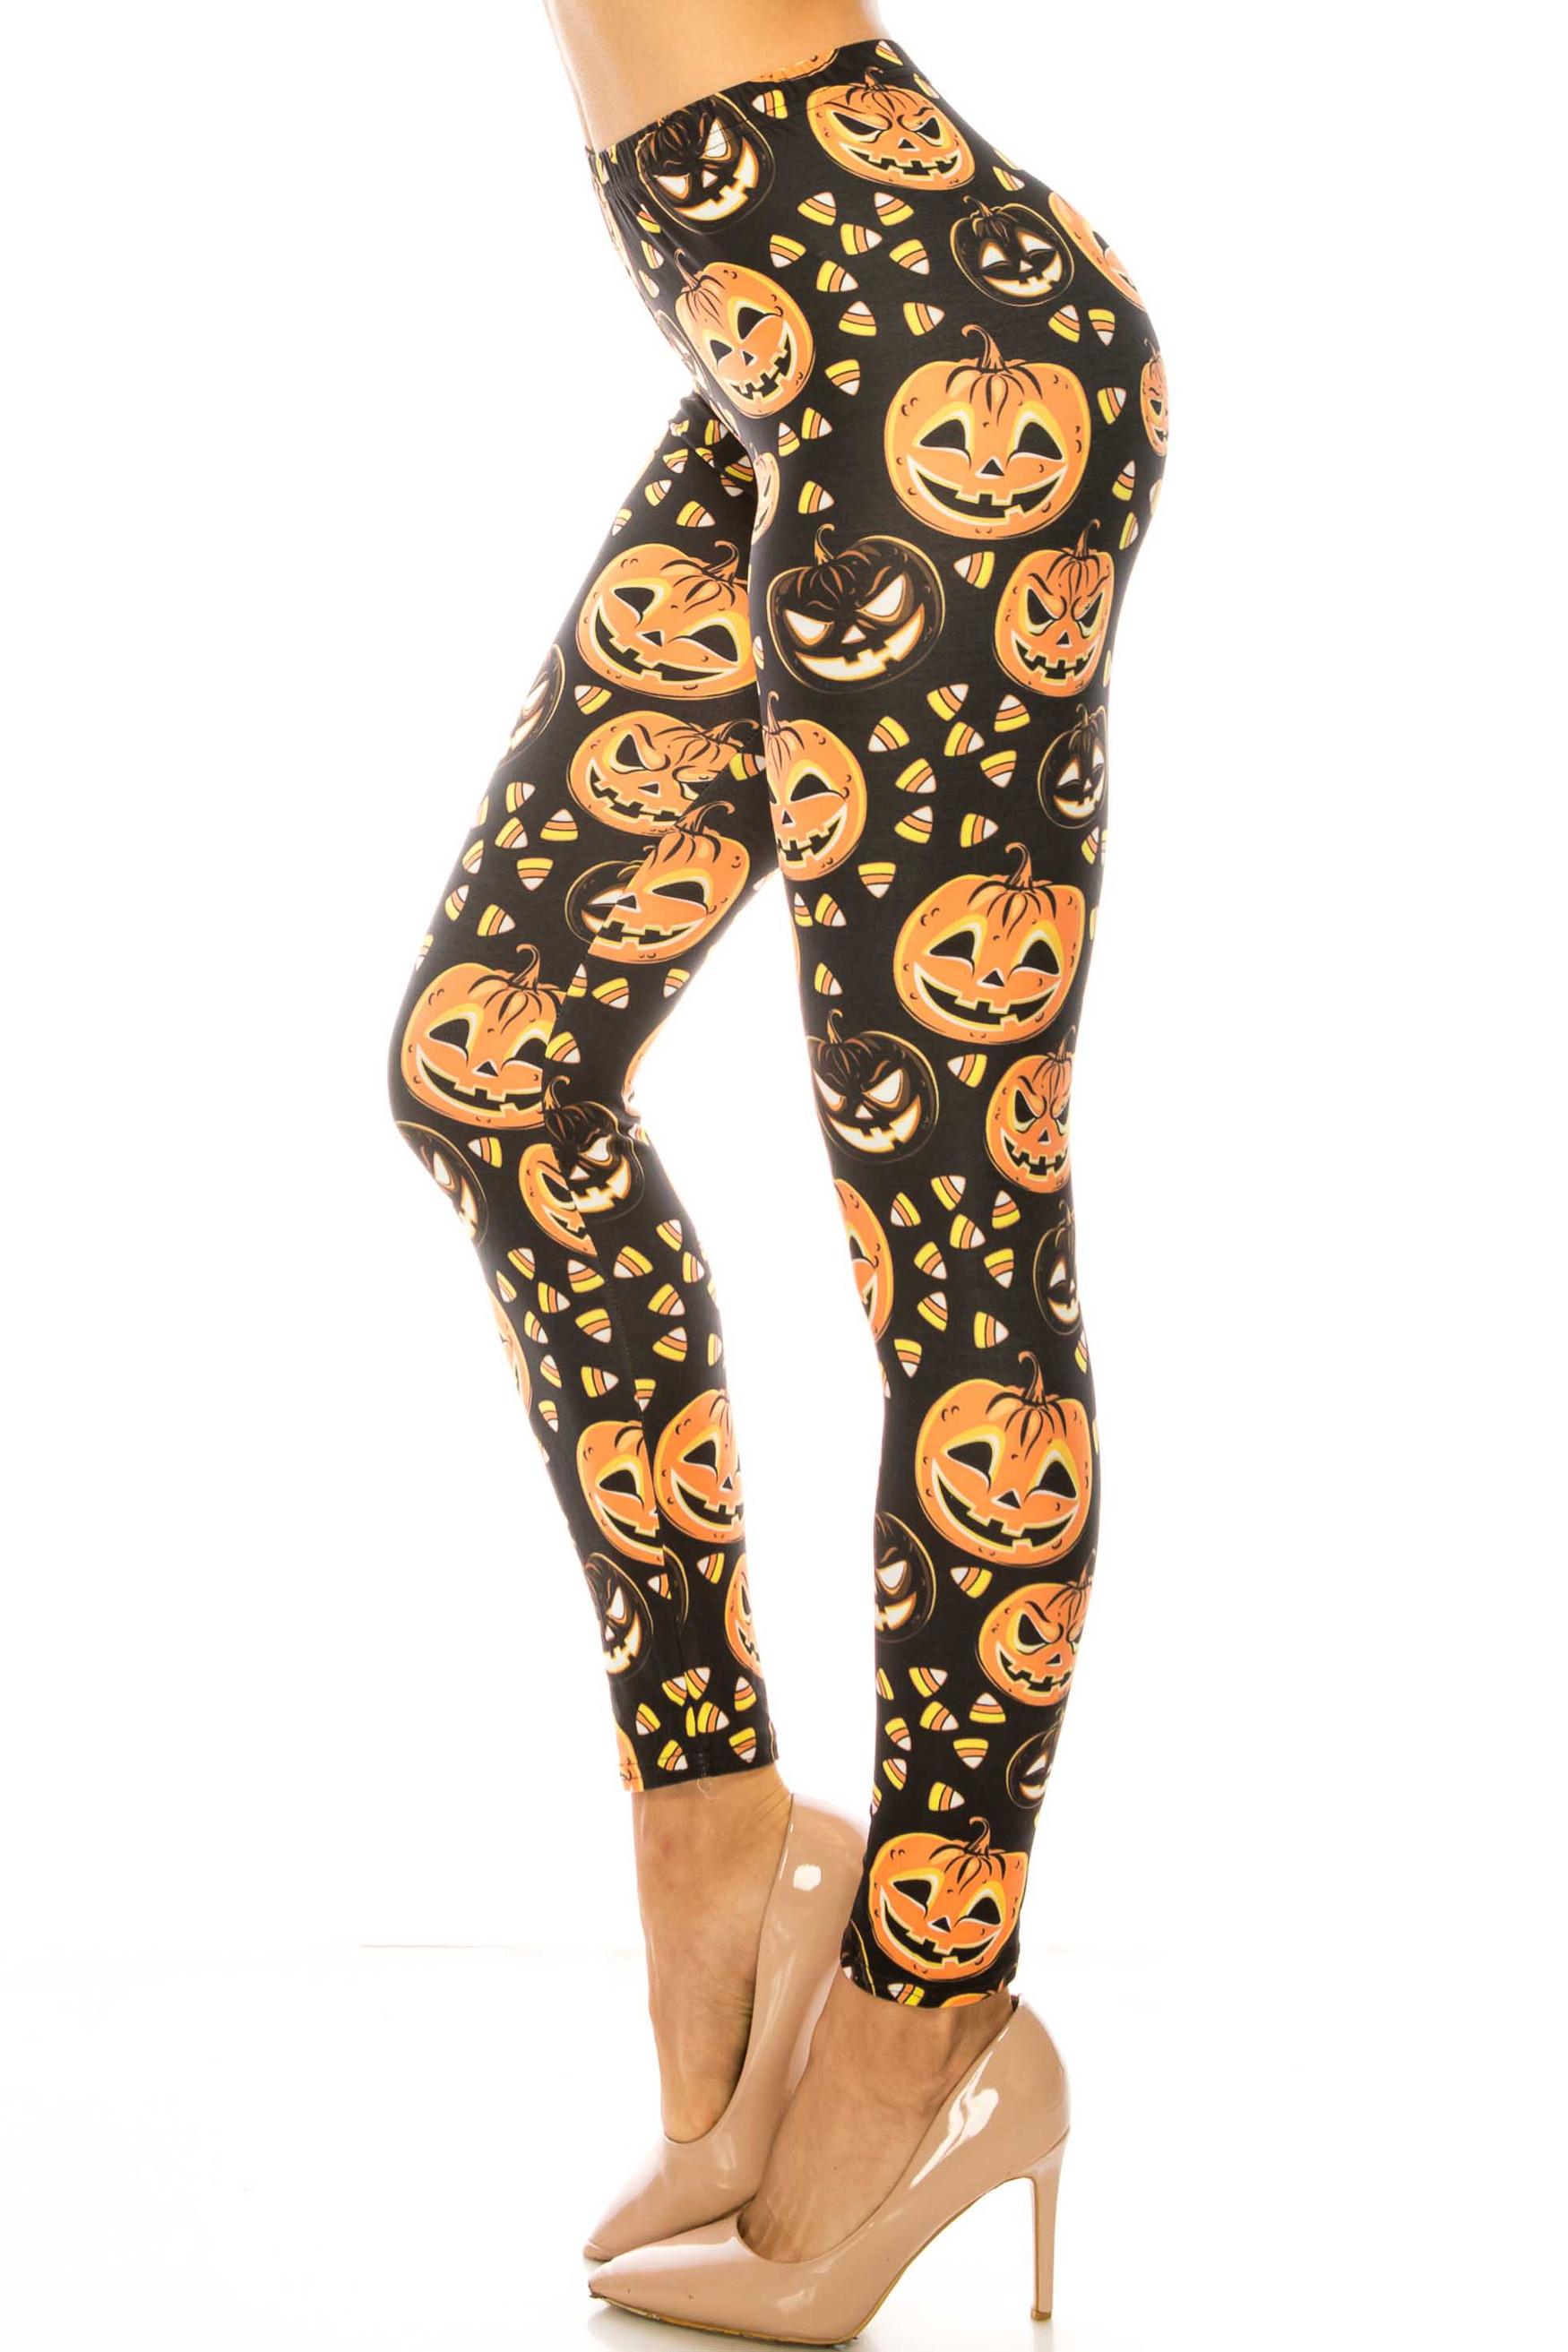 Creamy Soft Halloween Pumpkins Plus Size Leggings - USA Fashion™